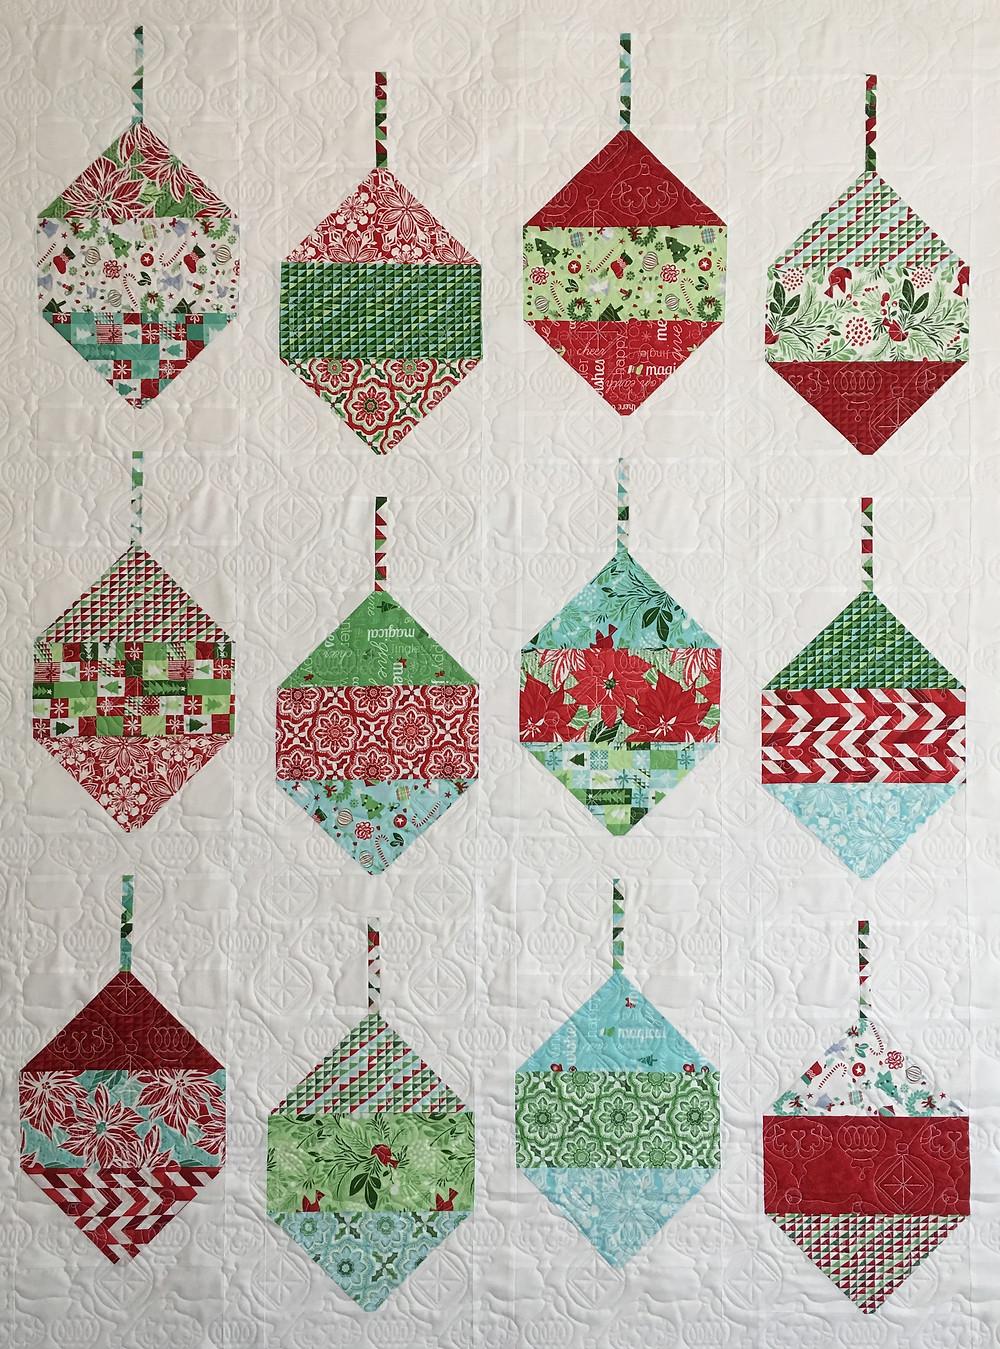 Christmas Ornament Quilt by Delfina Guerra